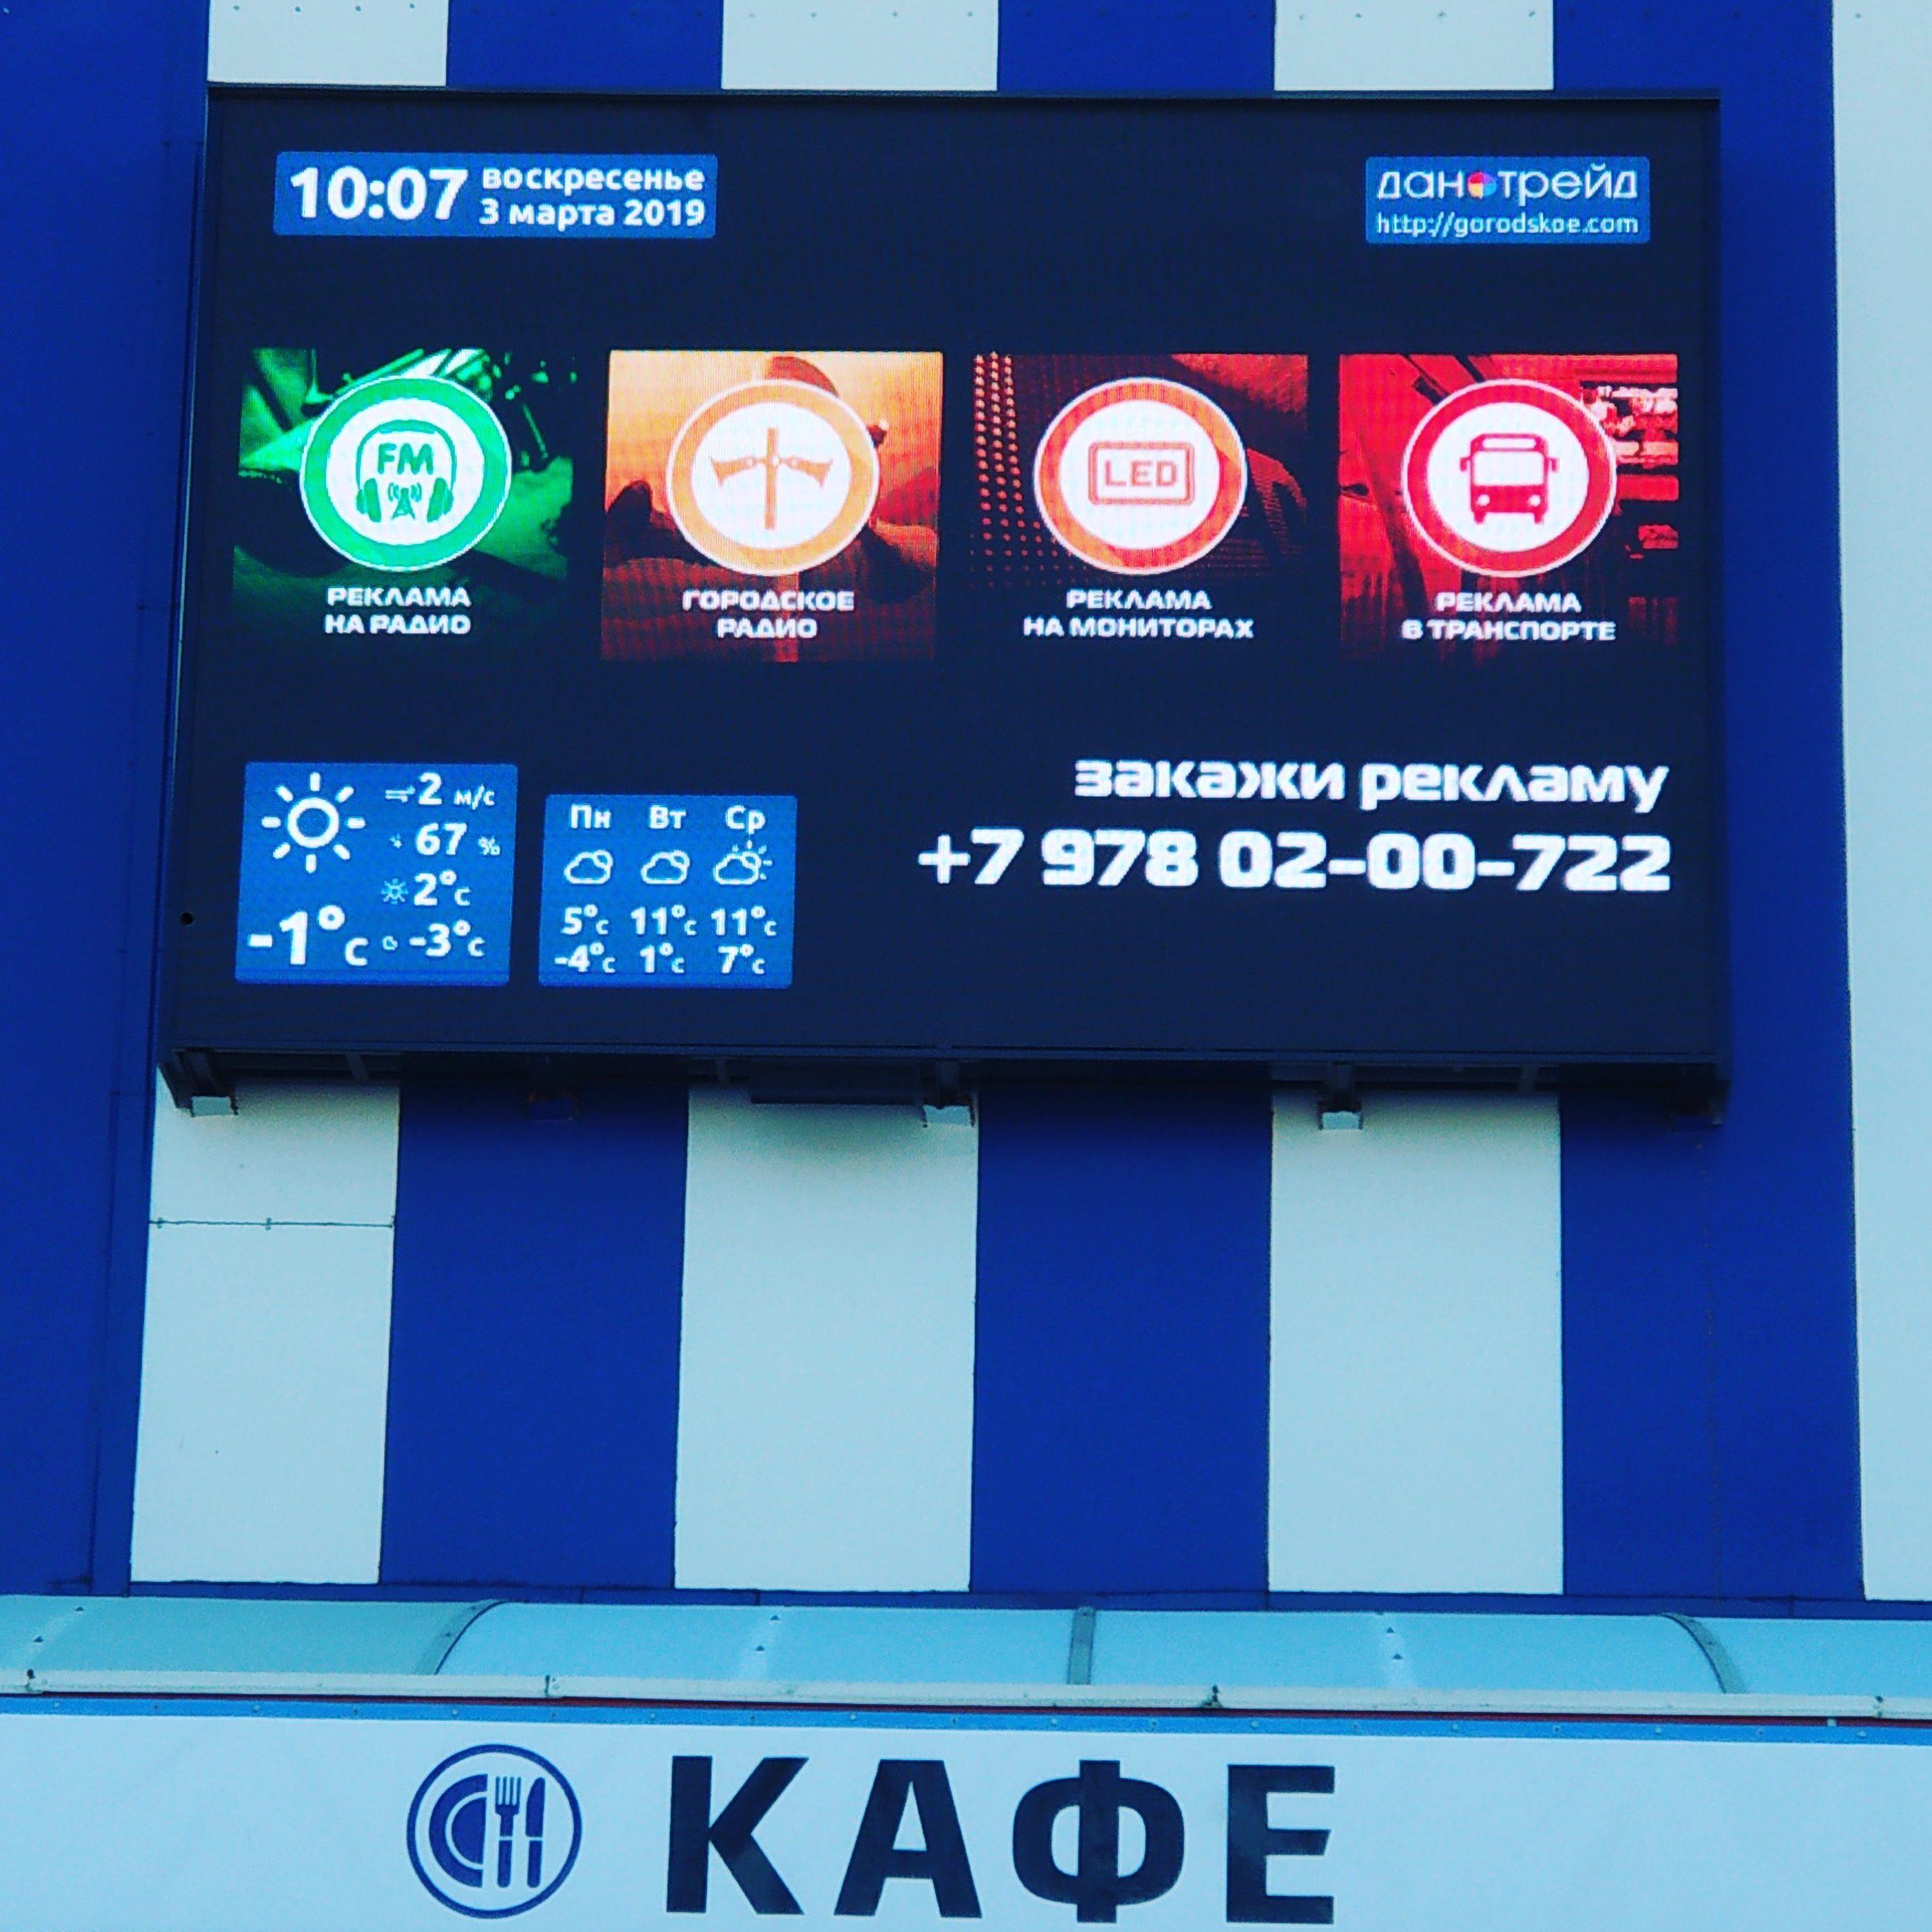 Реклама на мониторах - ТЦ «Новацентр»